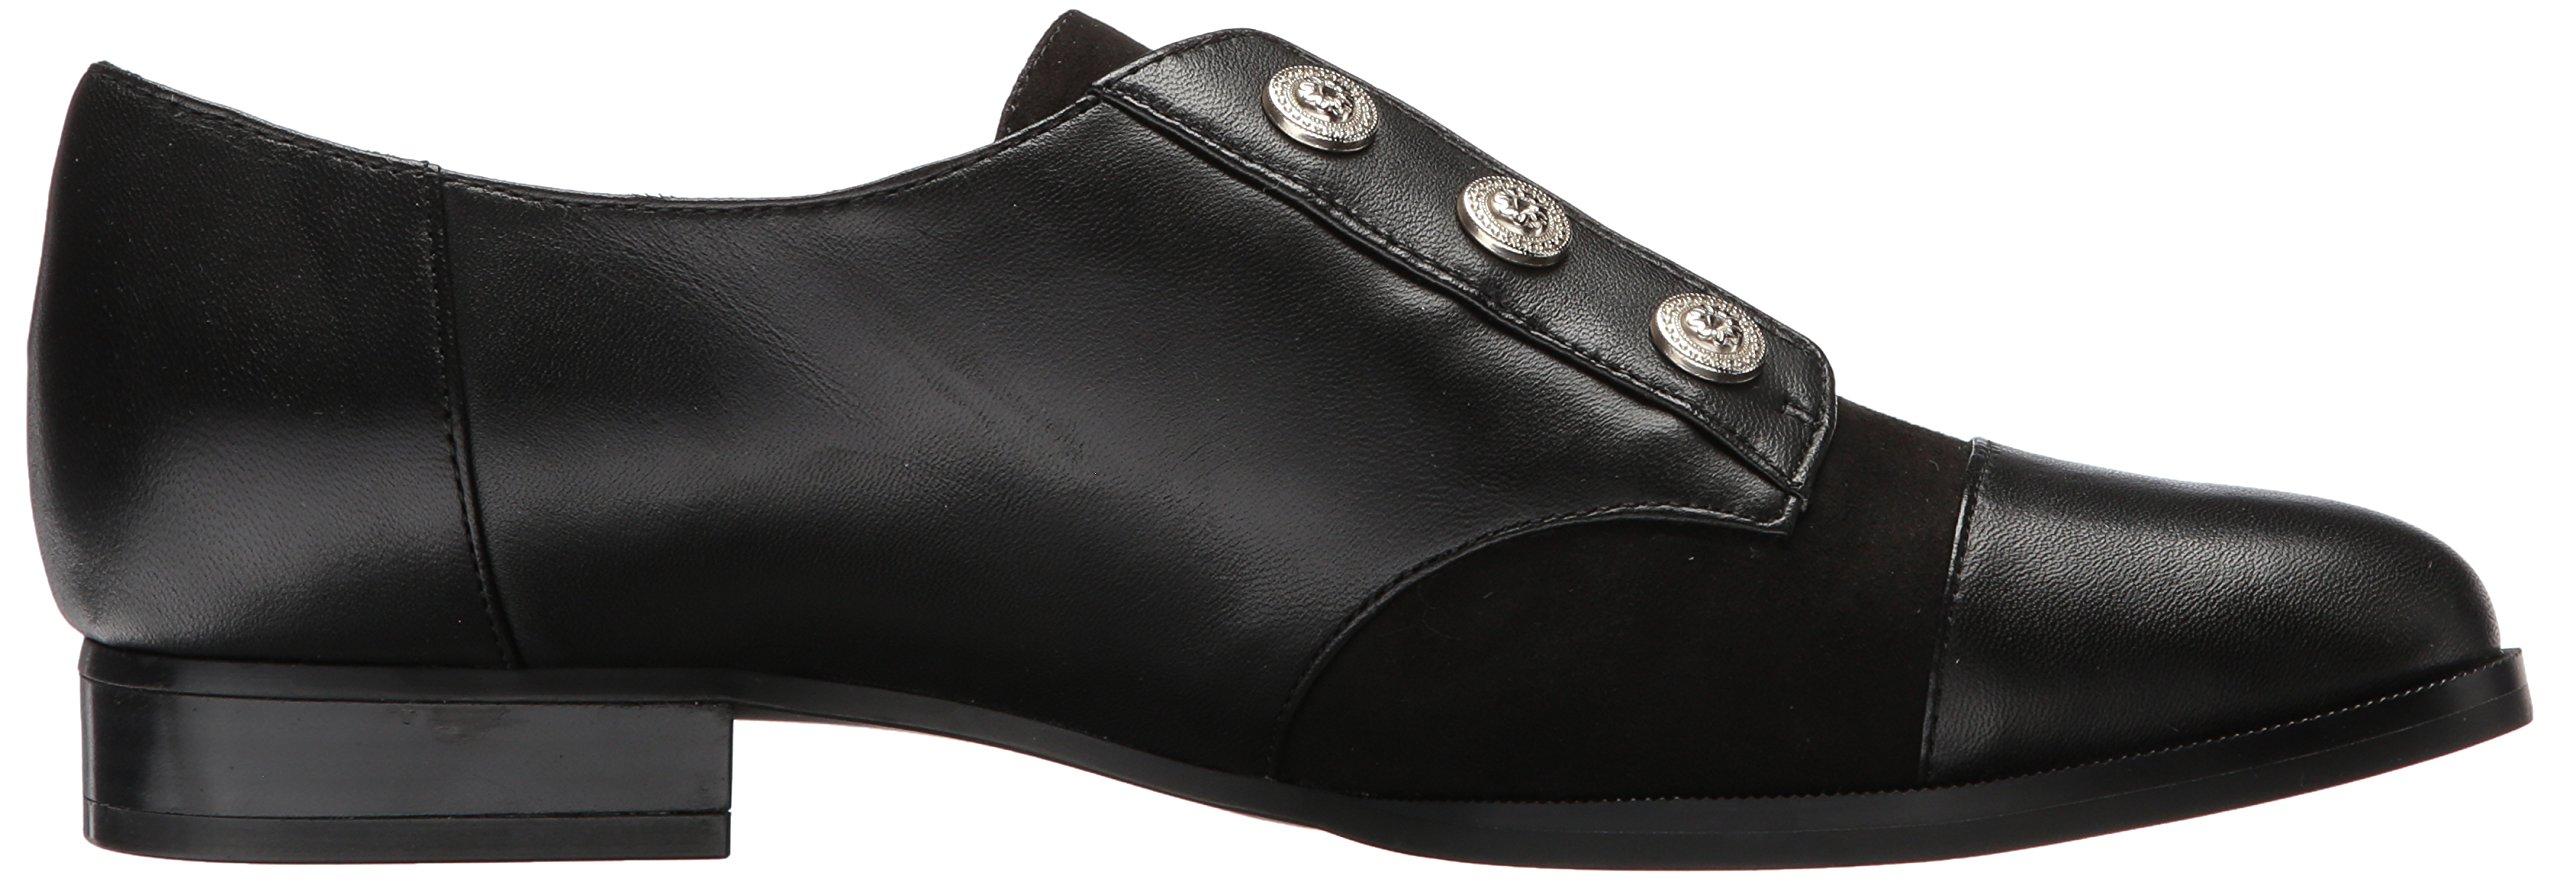 Nine West Women's Here Leather Uniform Dress Shoe, Black/Multi Leather, 5 M US by Nine West (Image #7)